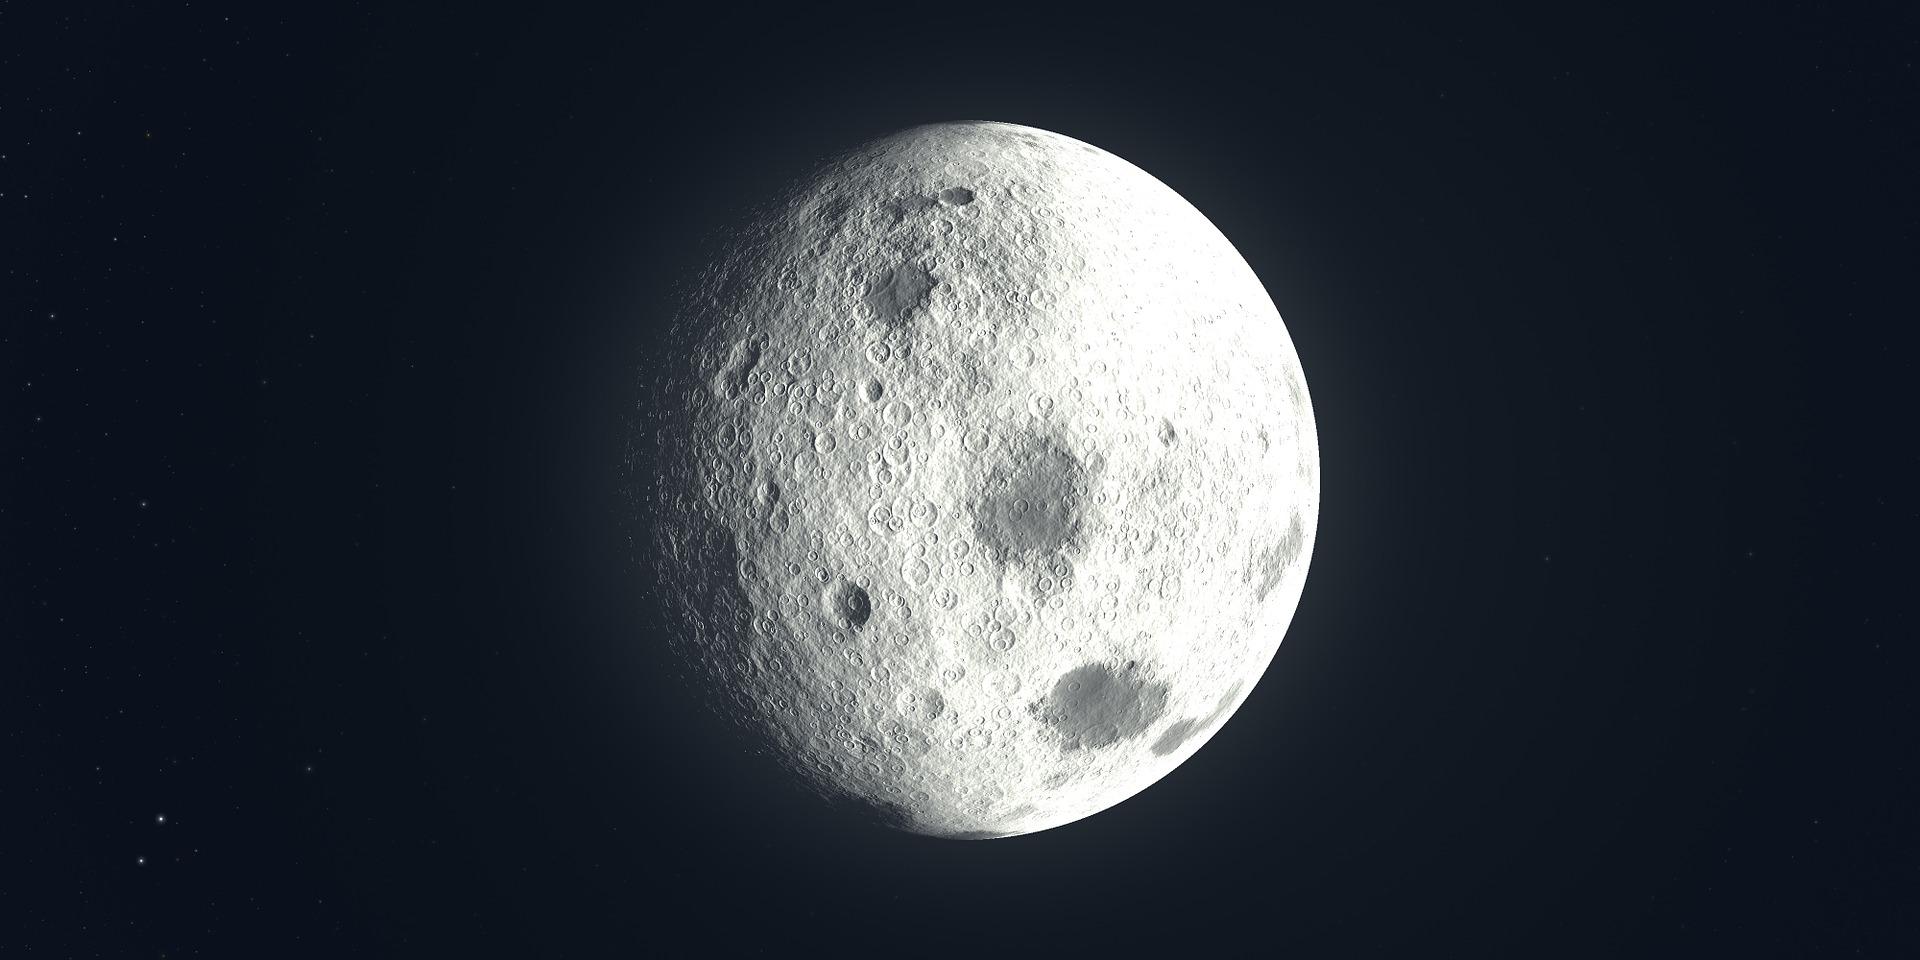 Mond, Satellit, Raum, Universum, Astronomie - Wallpaper HD - Prof.-falken.com